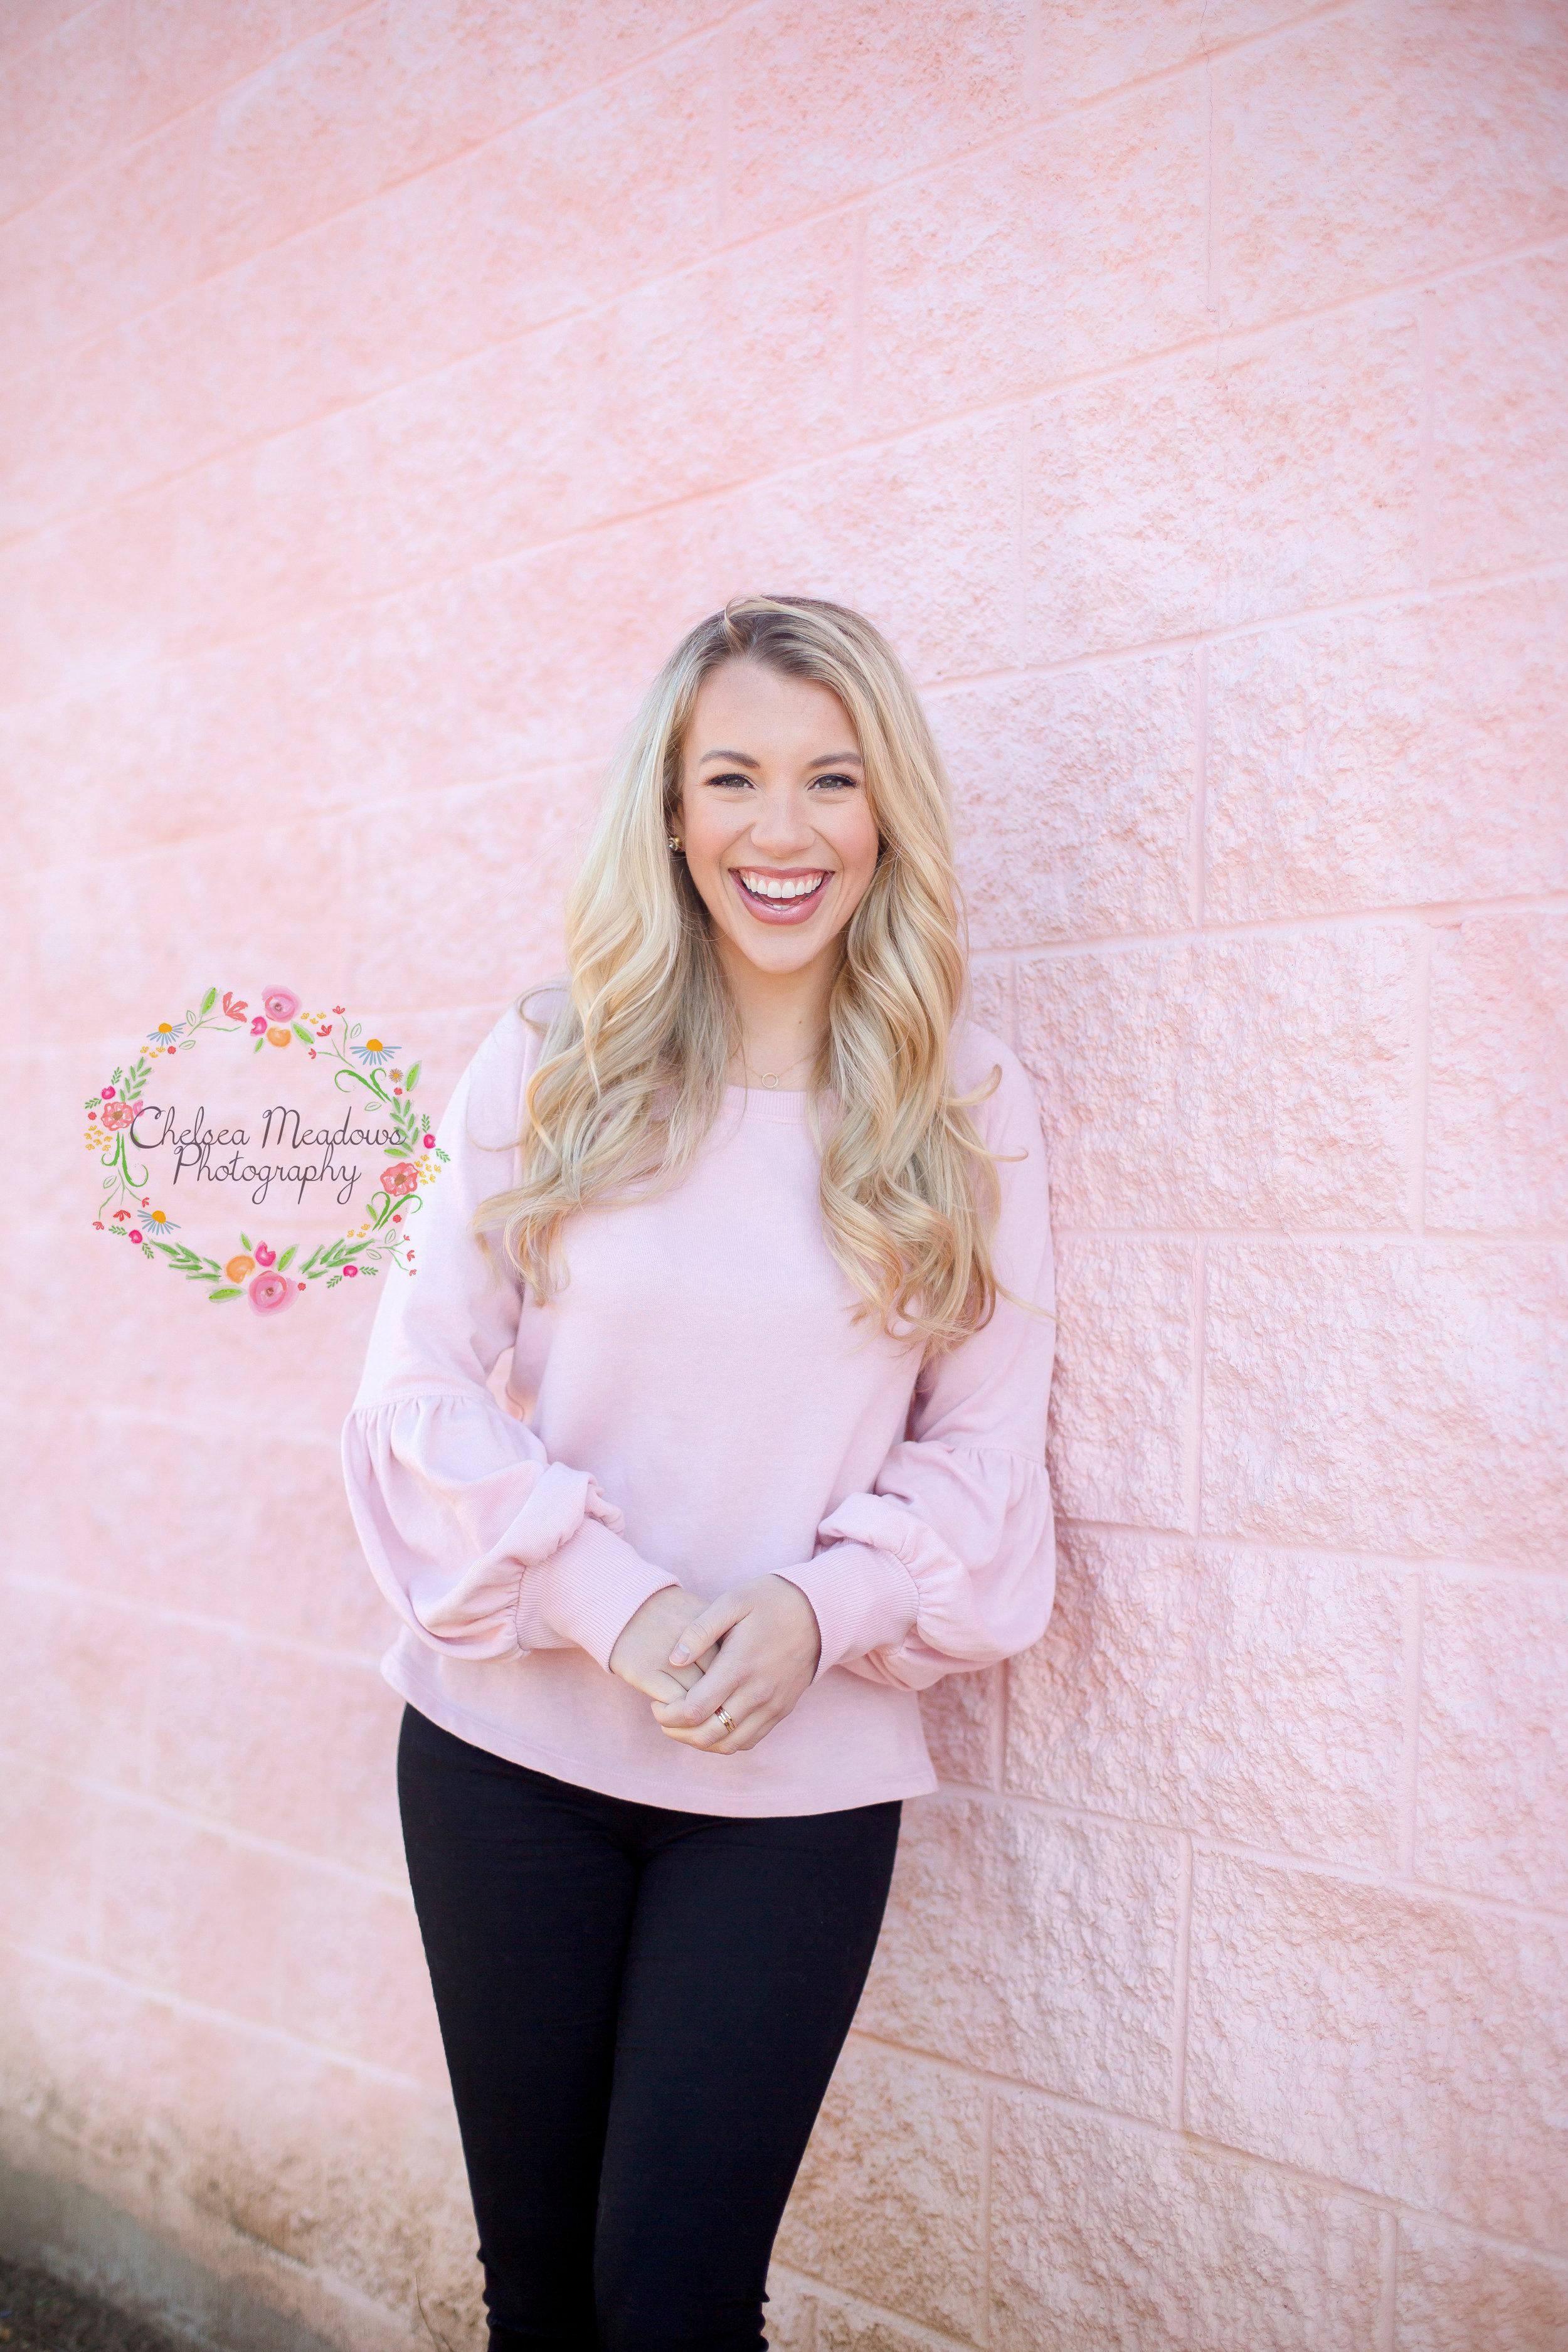 Lauren Cummings - Nashville Beauty Blogger - Chelsea Meadows Photography (38)_edited-2.jpg